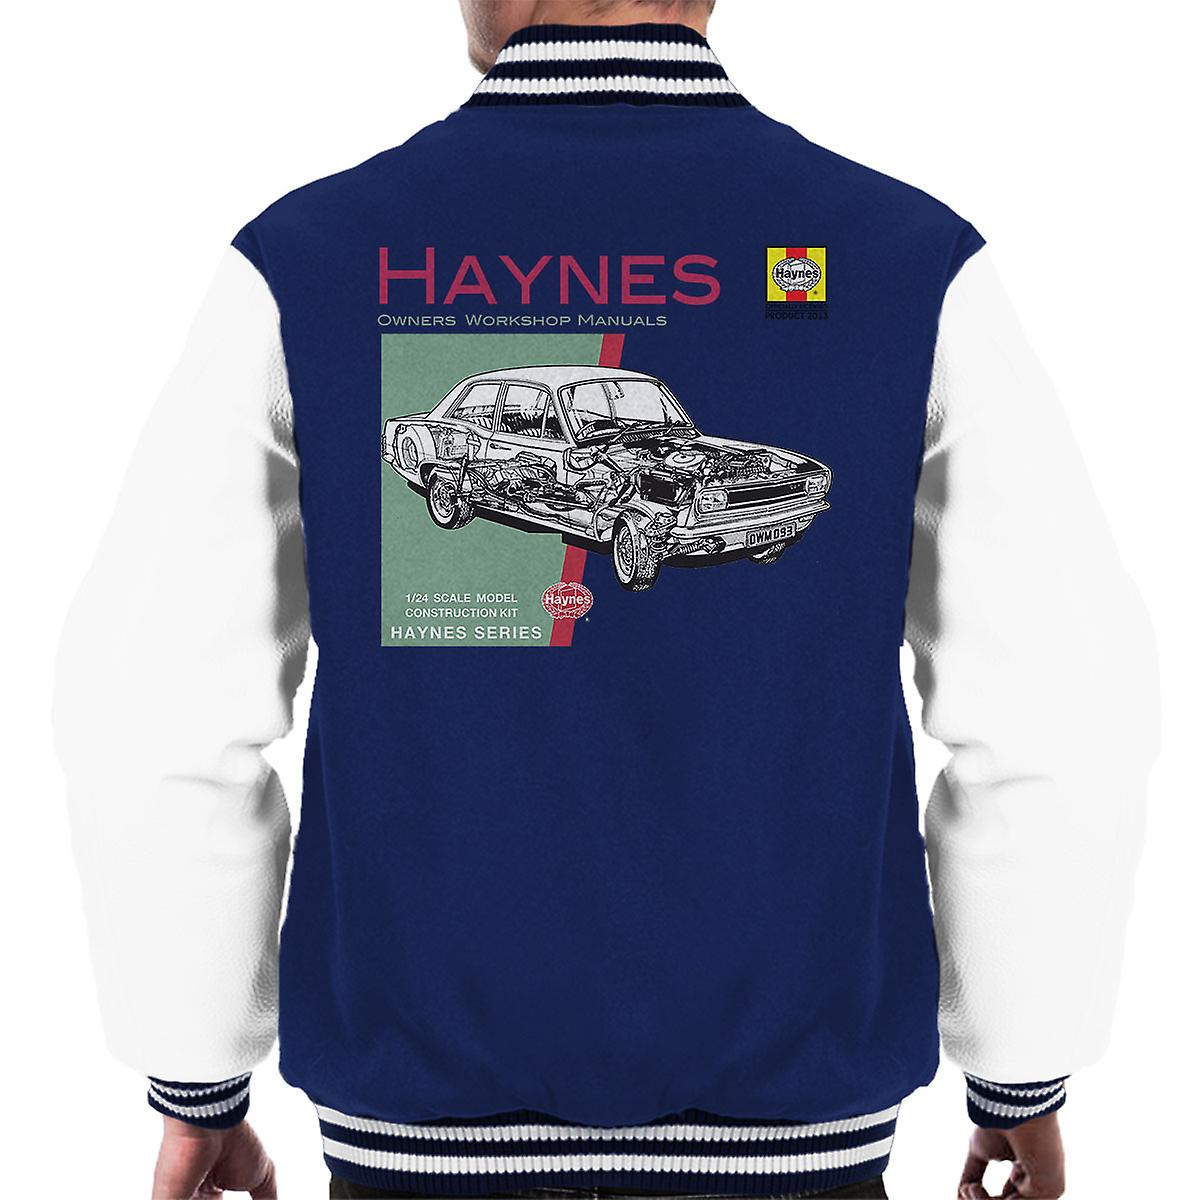 Haynes eiere Workshop manuell 0093 Vauxhall Viva menn Varsity jakke